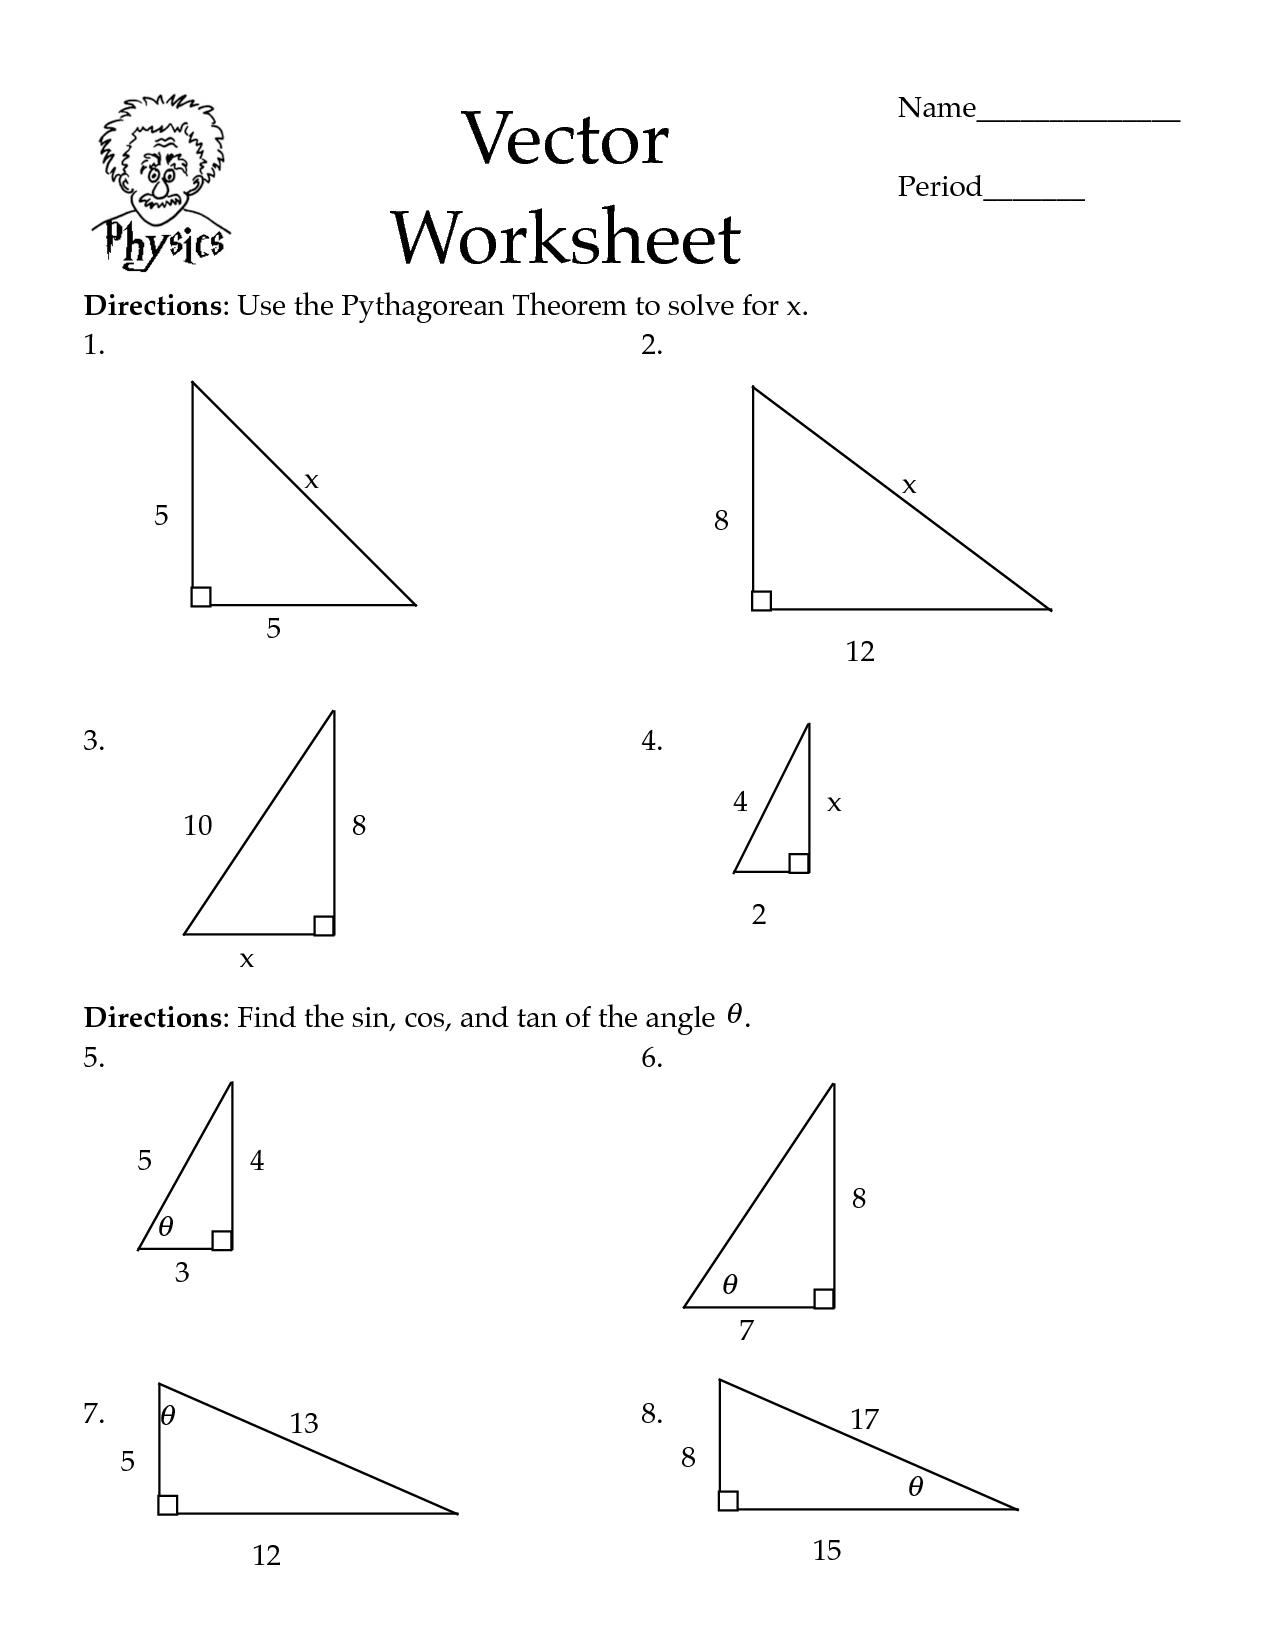 pythagorean theorem worksheets | Cos Law Worksheet - PDF ...